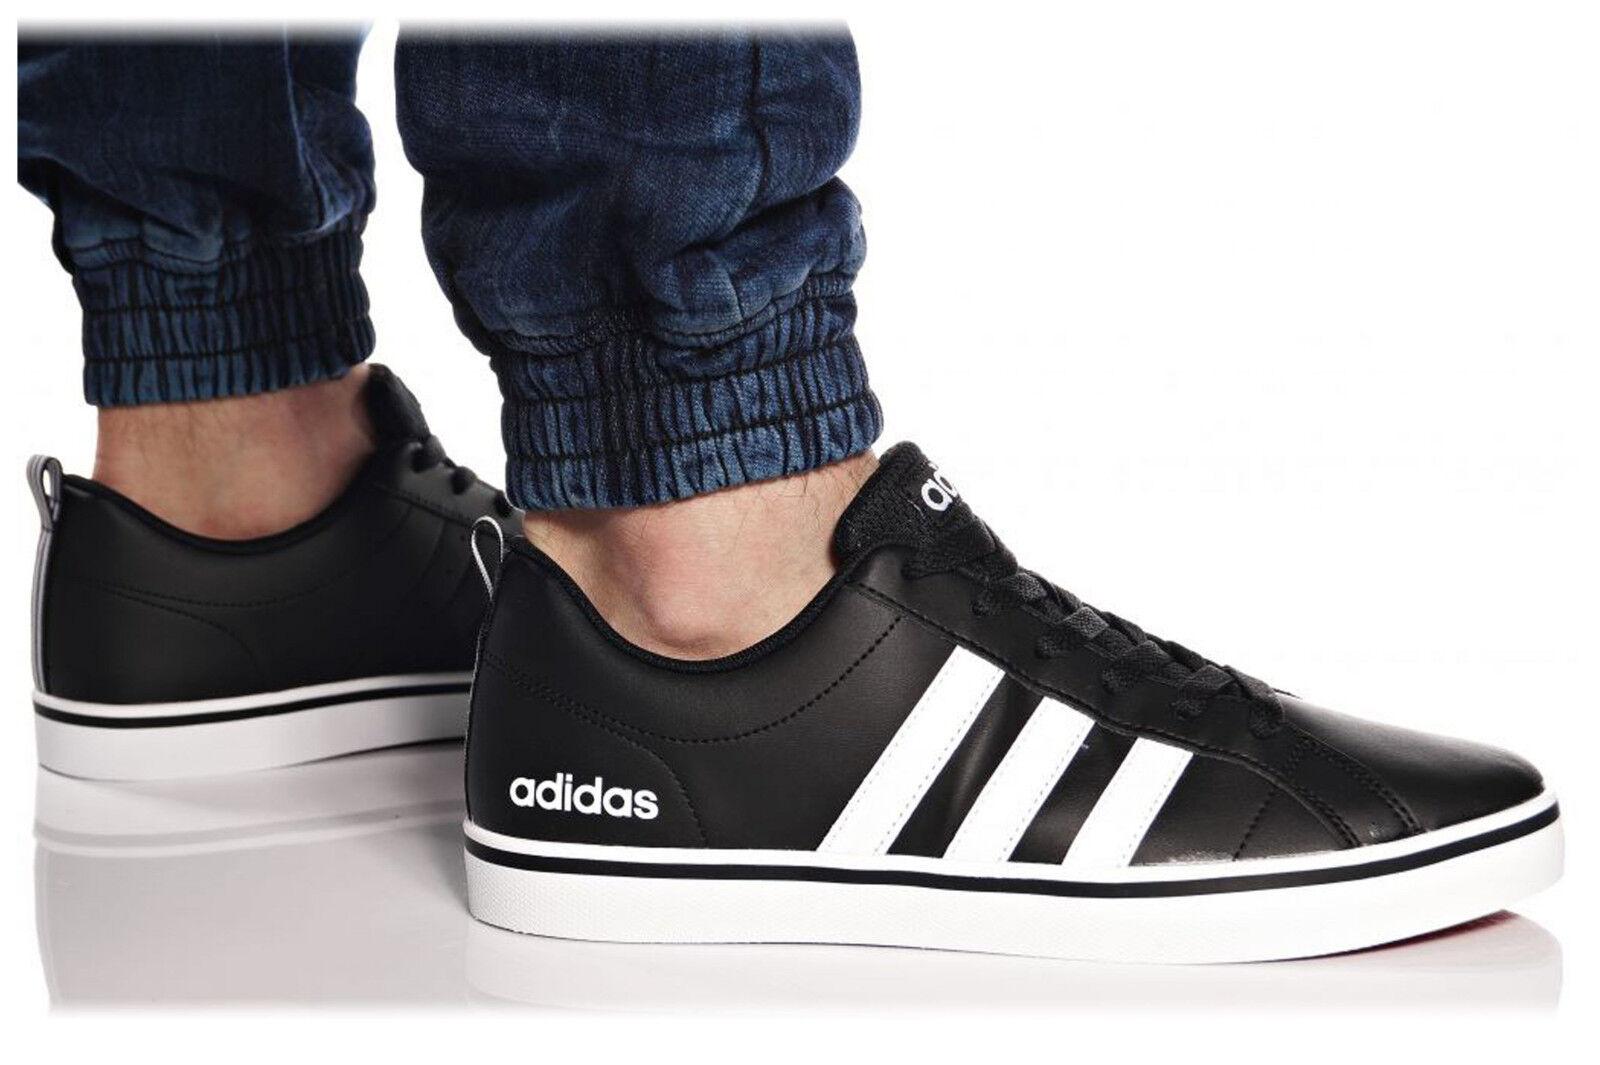 Adidas Men Shoes Fashion Sneakers Man VS Pace 3 Stripes Casual Black B74494 New